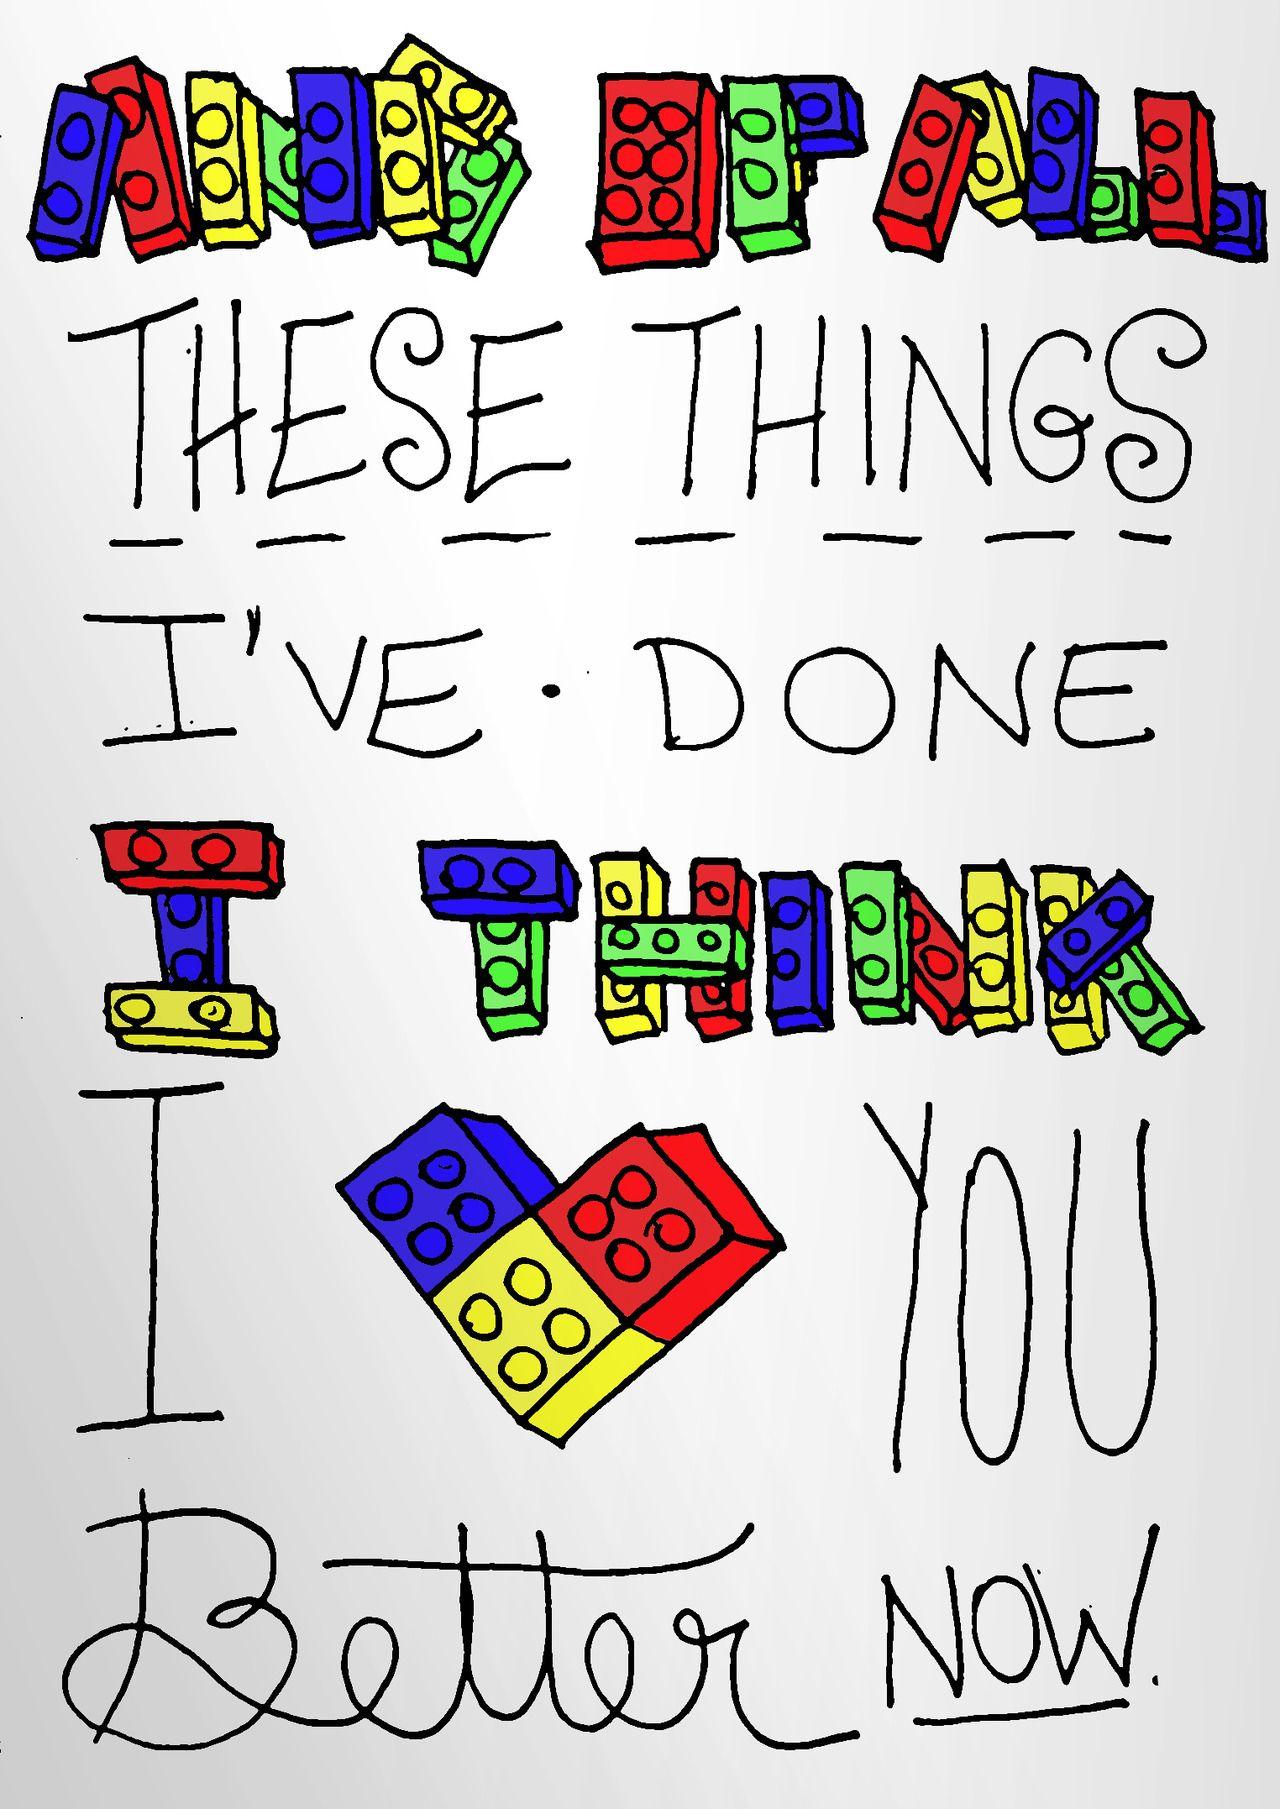 Lego House By Ed Sheeran Ed Sheeran Lyrics Ed Sheeran Lyrics